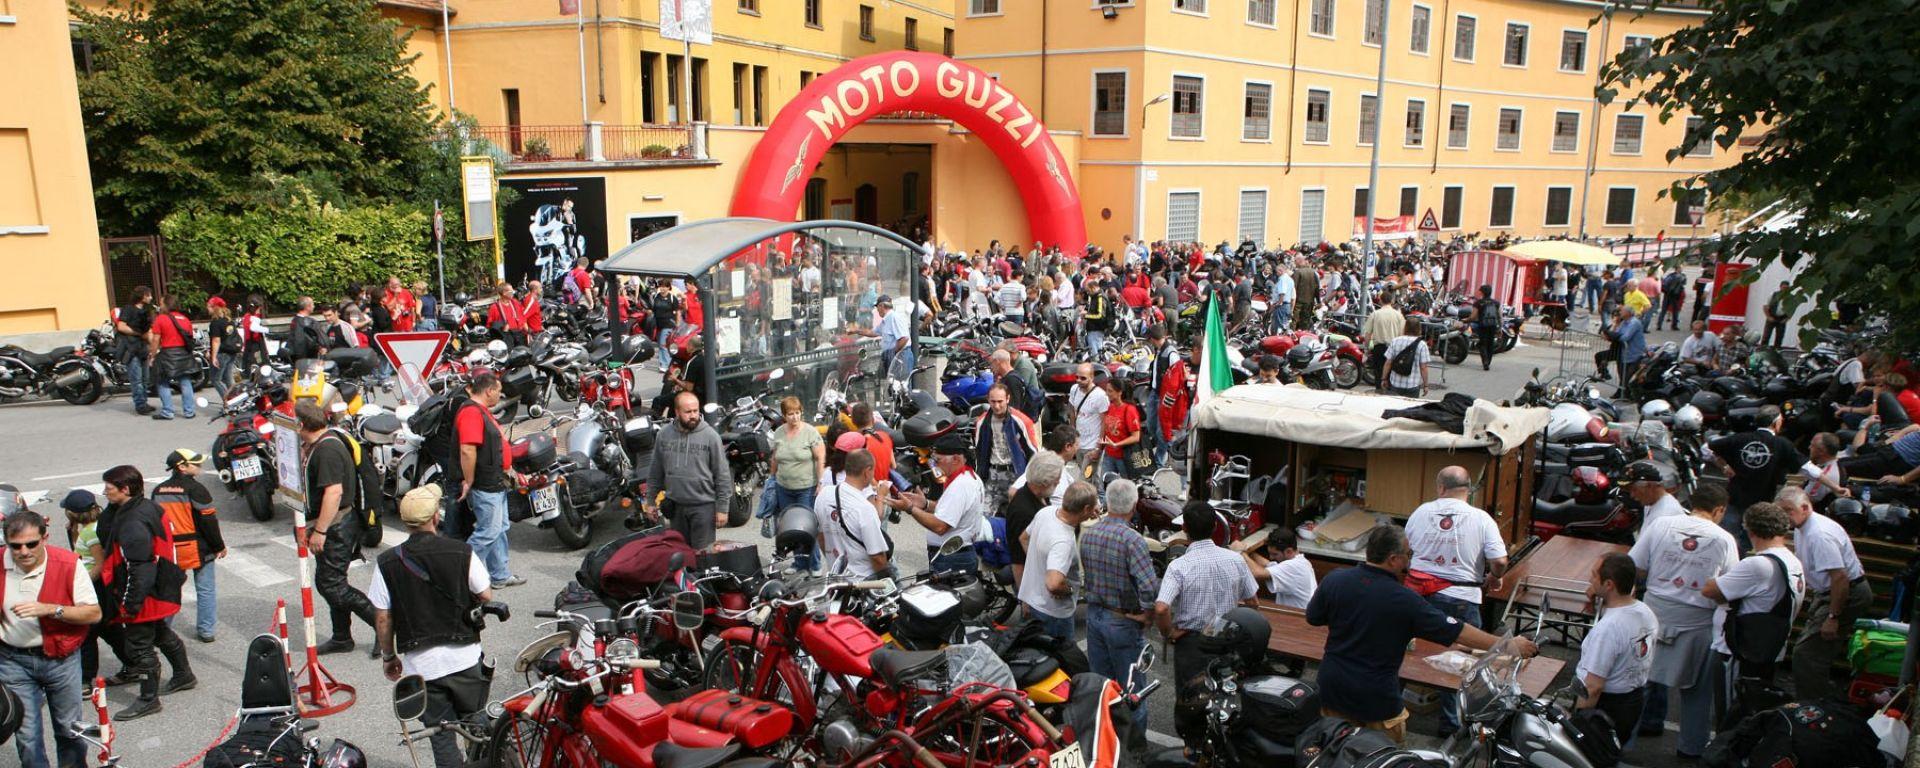 Moto Guzzi Open House 2015